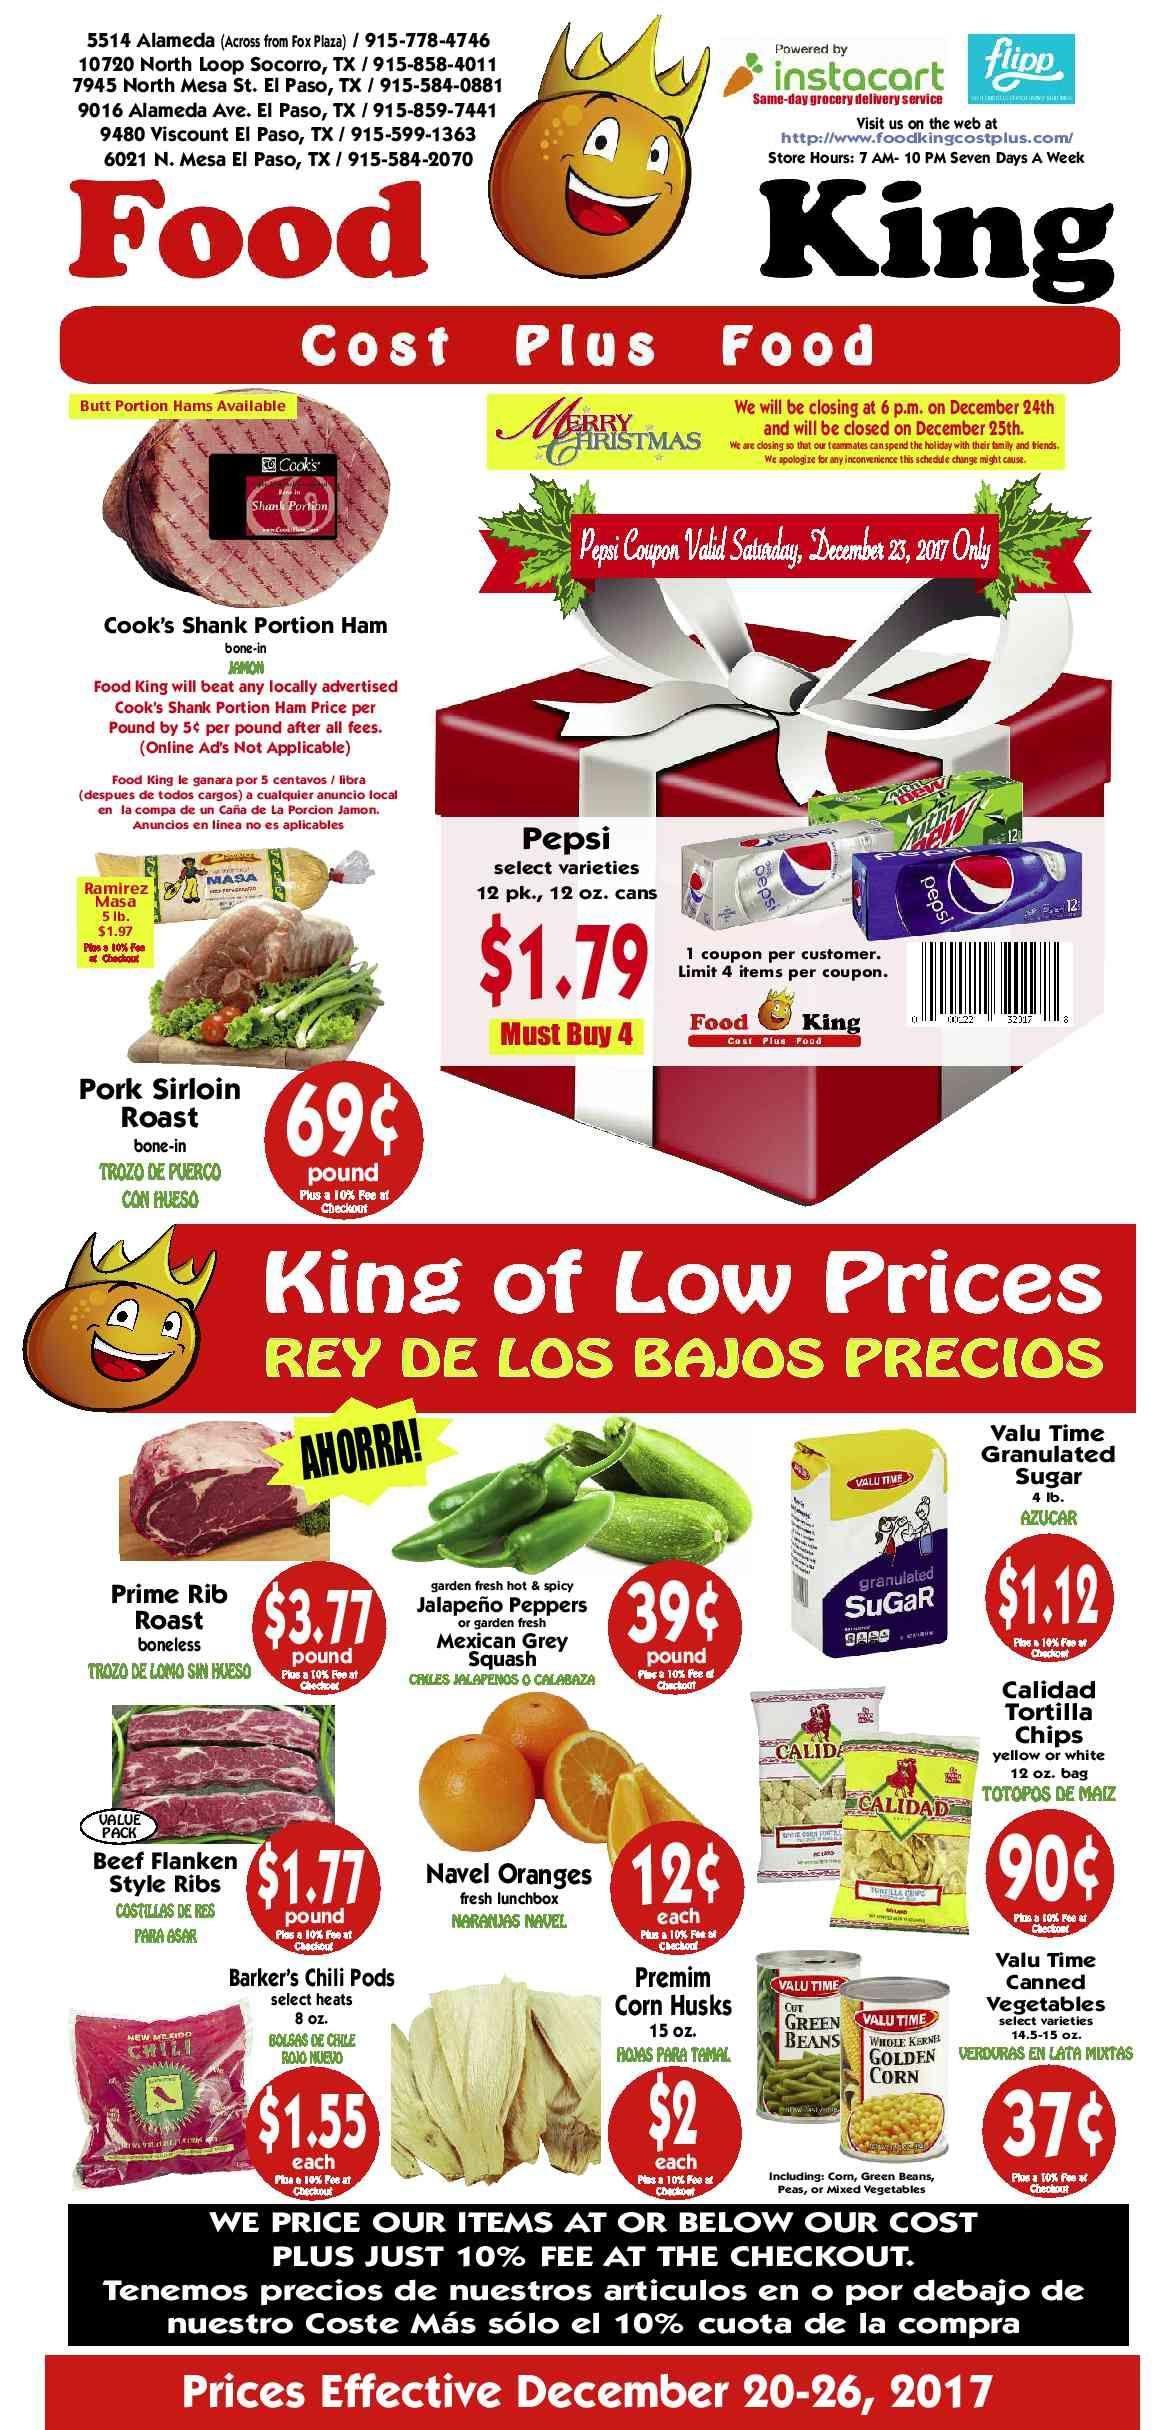 Food King Weekly Ad El Paso Tx : weekly, Weekly, December, Http://www.olcatalog.com/food-, King/food-king-weekly-ad.html, Food,, Foods